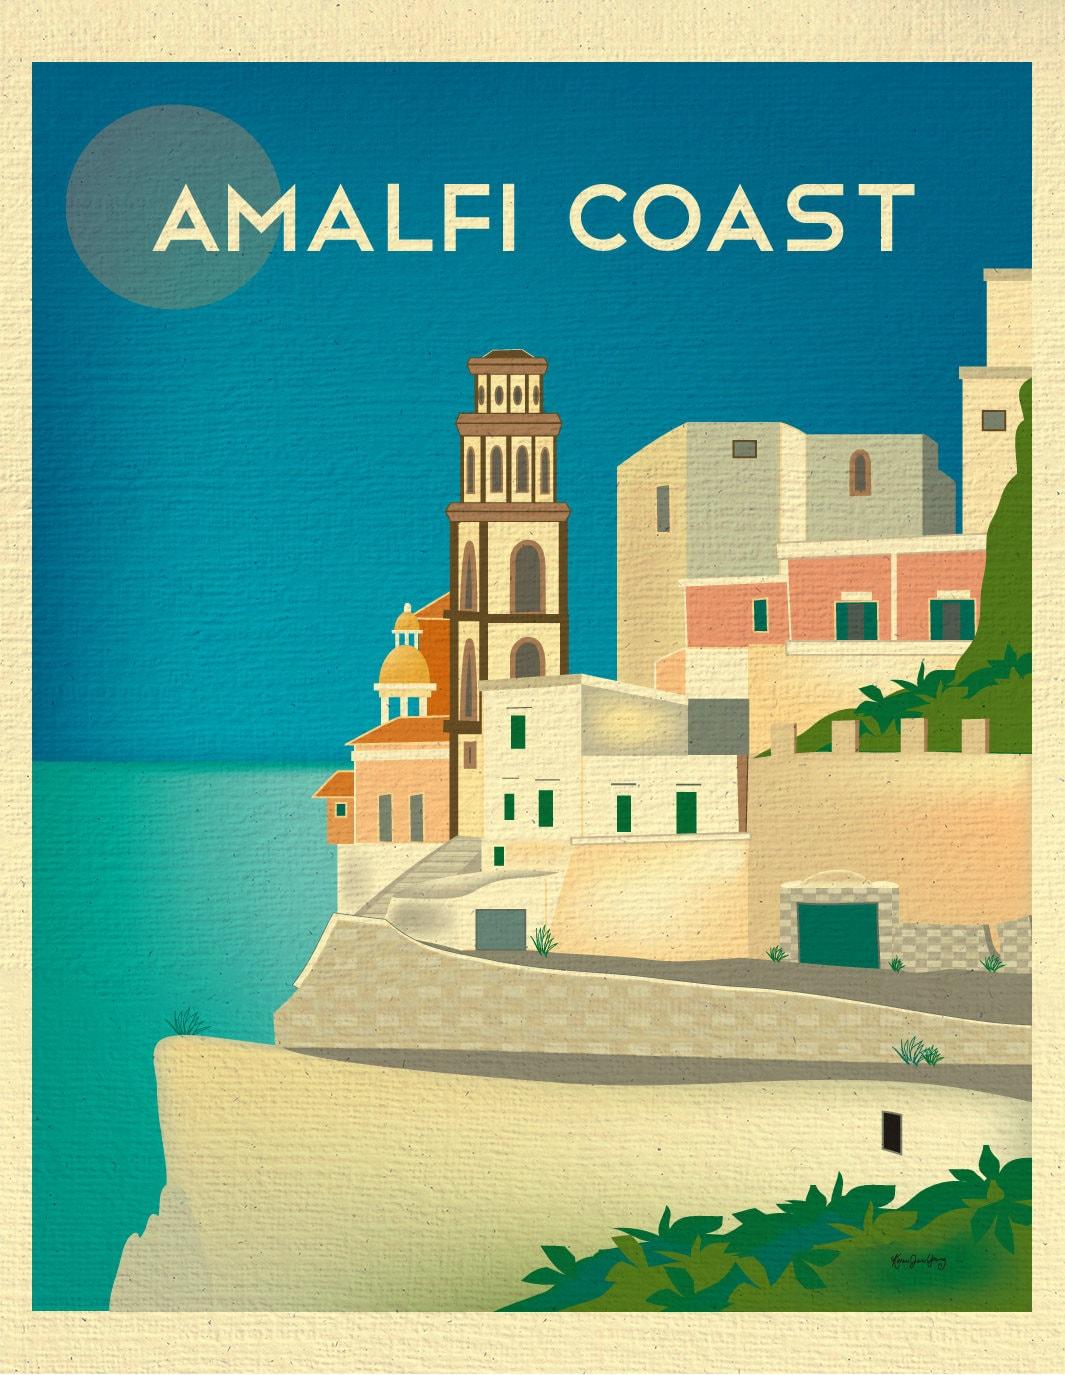 Amalfi Coast Print Positano Italy Amalfi Coast Poster | Etsy